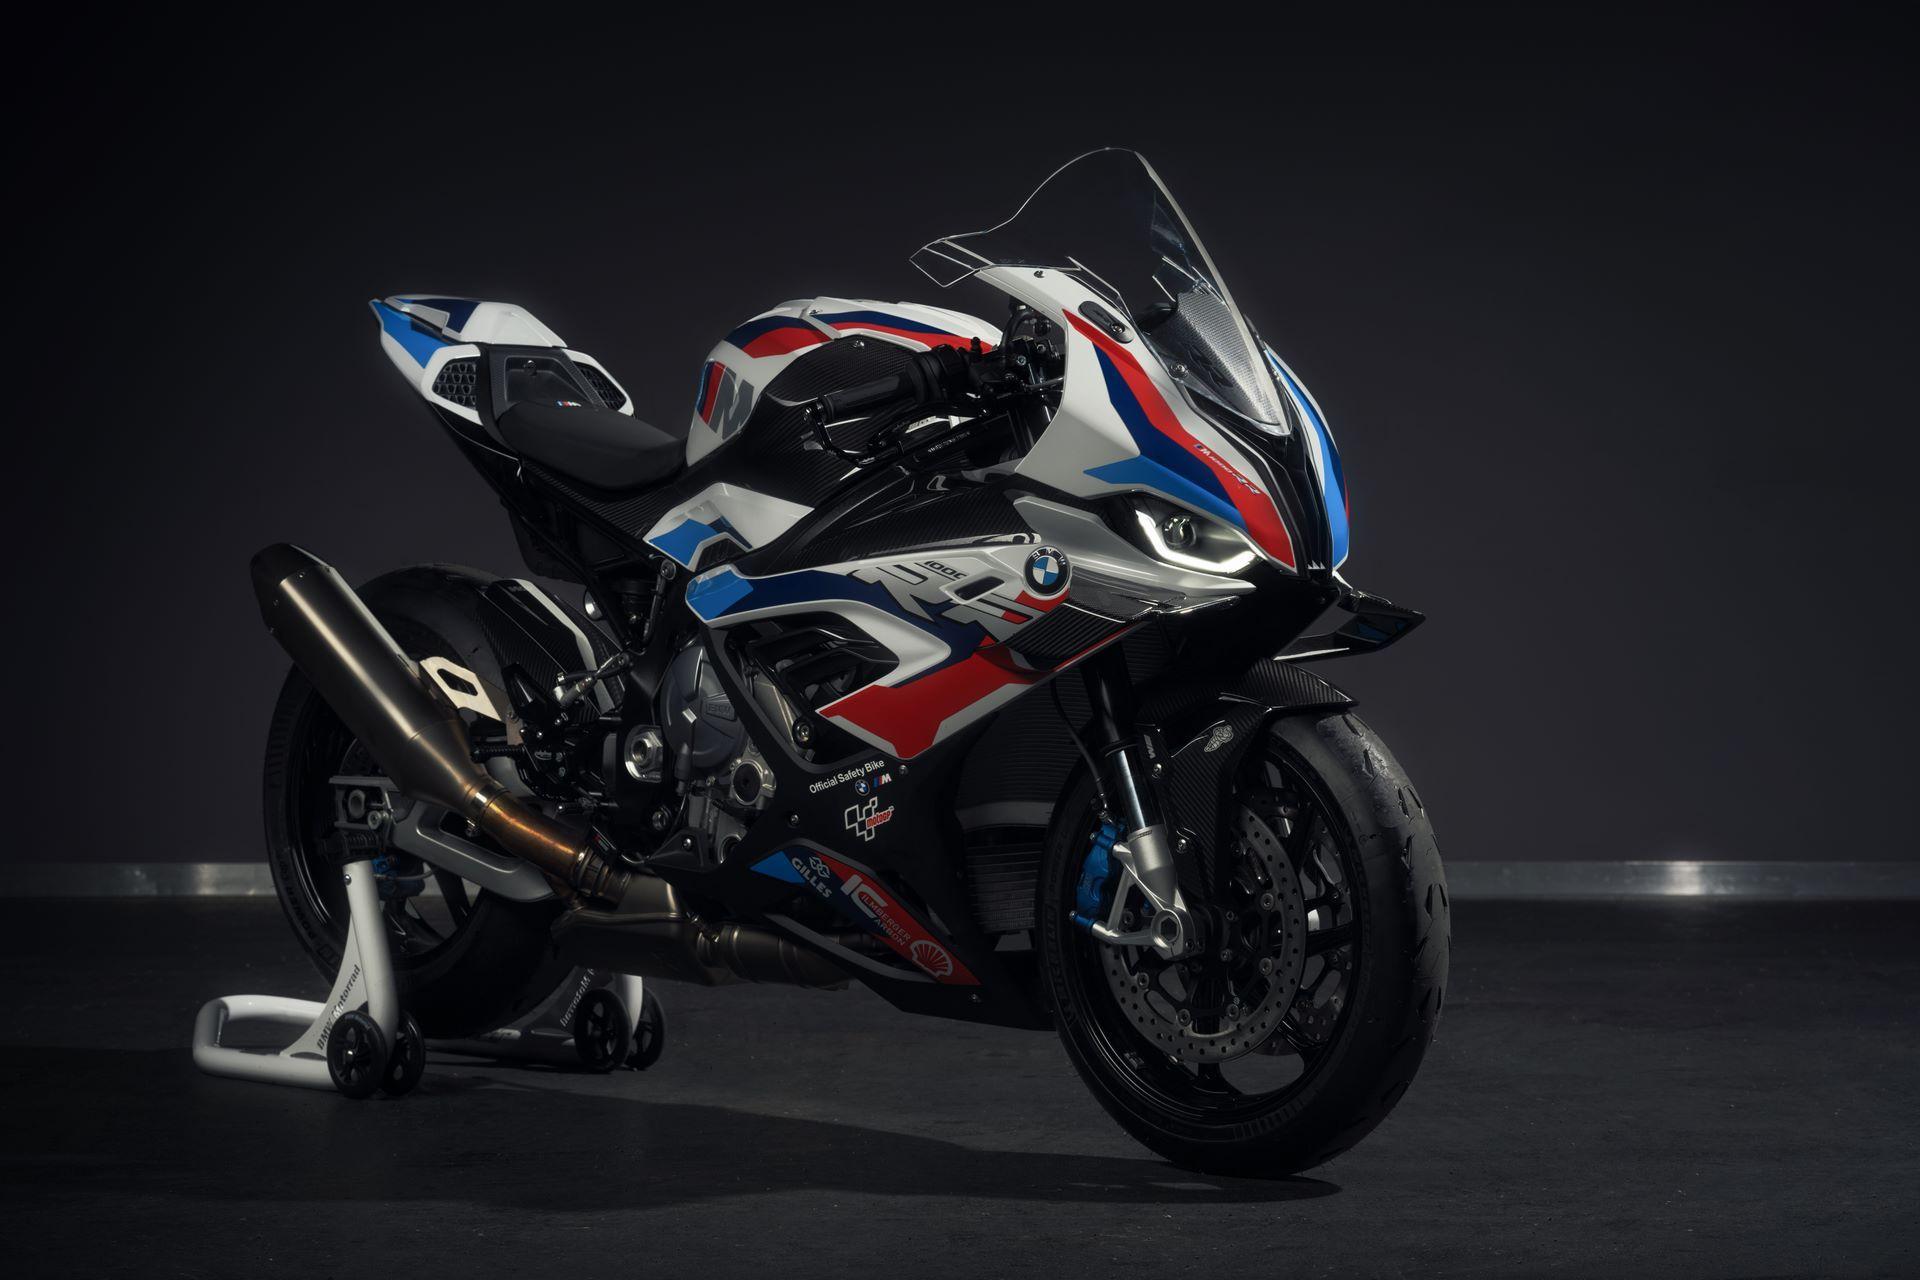 BMW-M-1000-RR-safety-bike-moto-gp-motogp-18